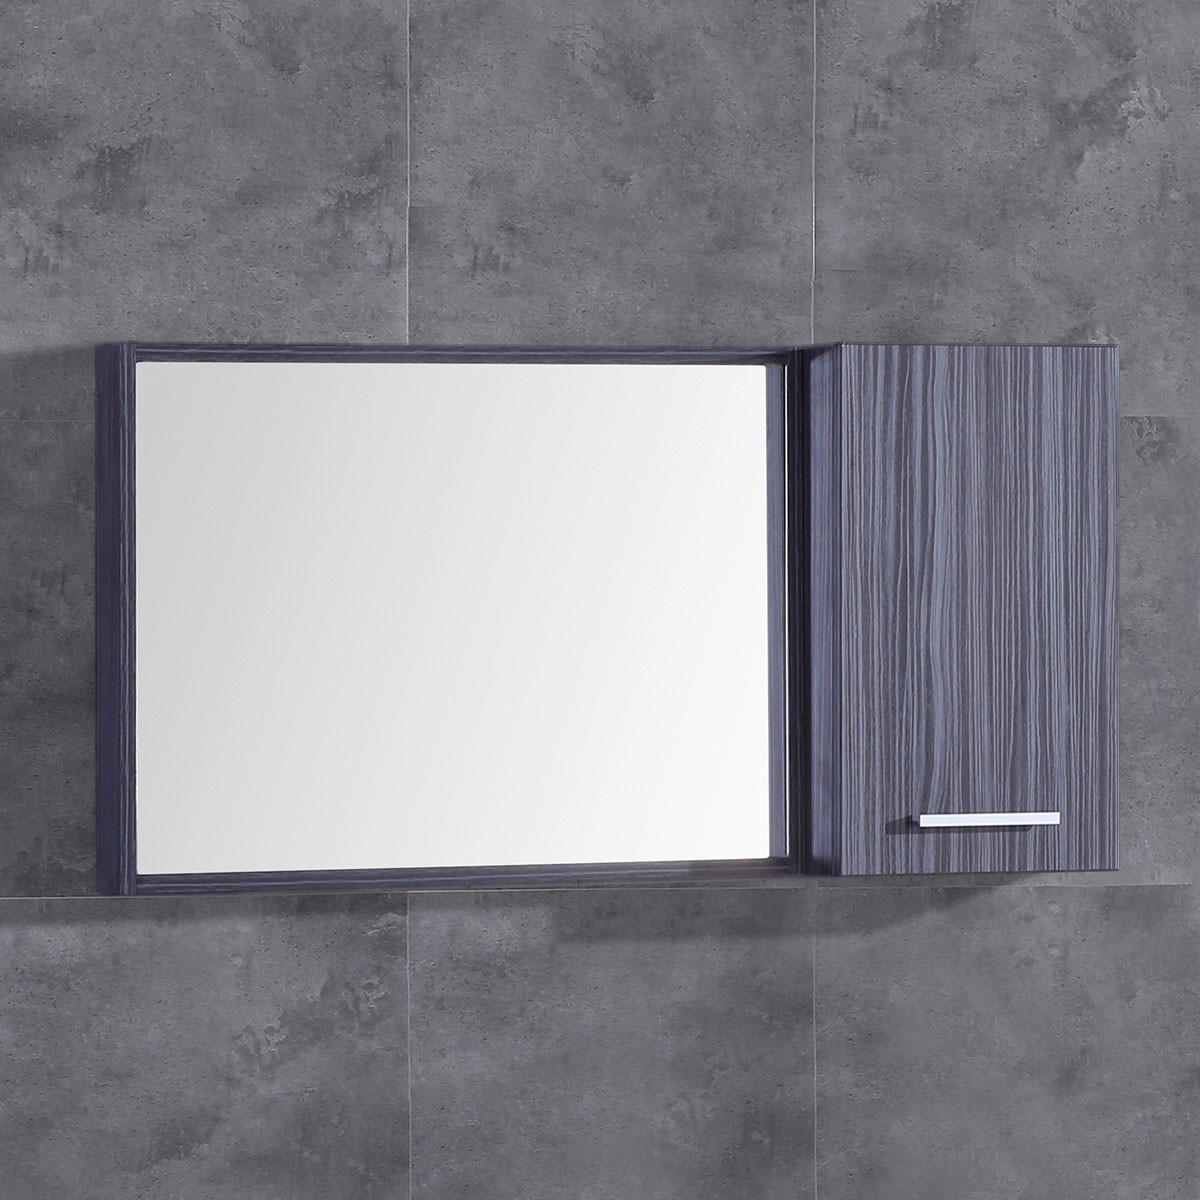 40 x 28 In. Mirror Cabinet (DK-T5041-M)